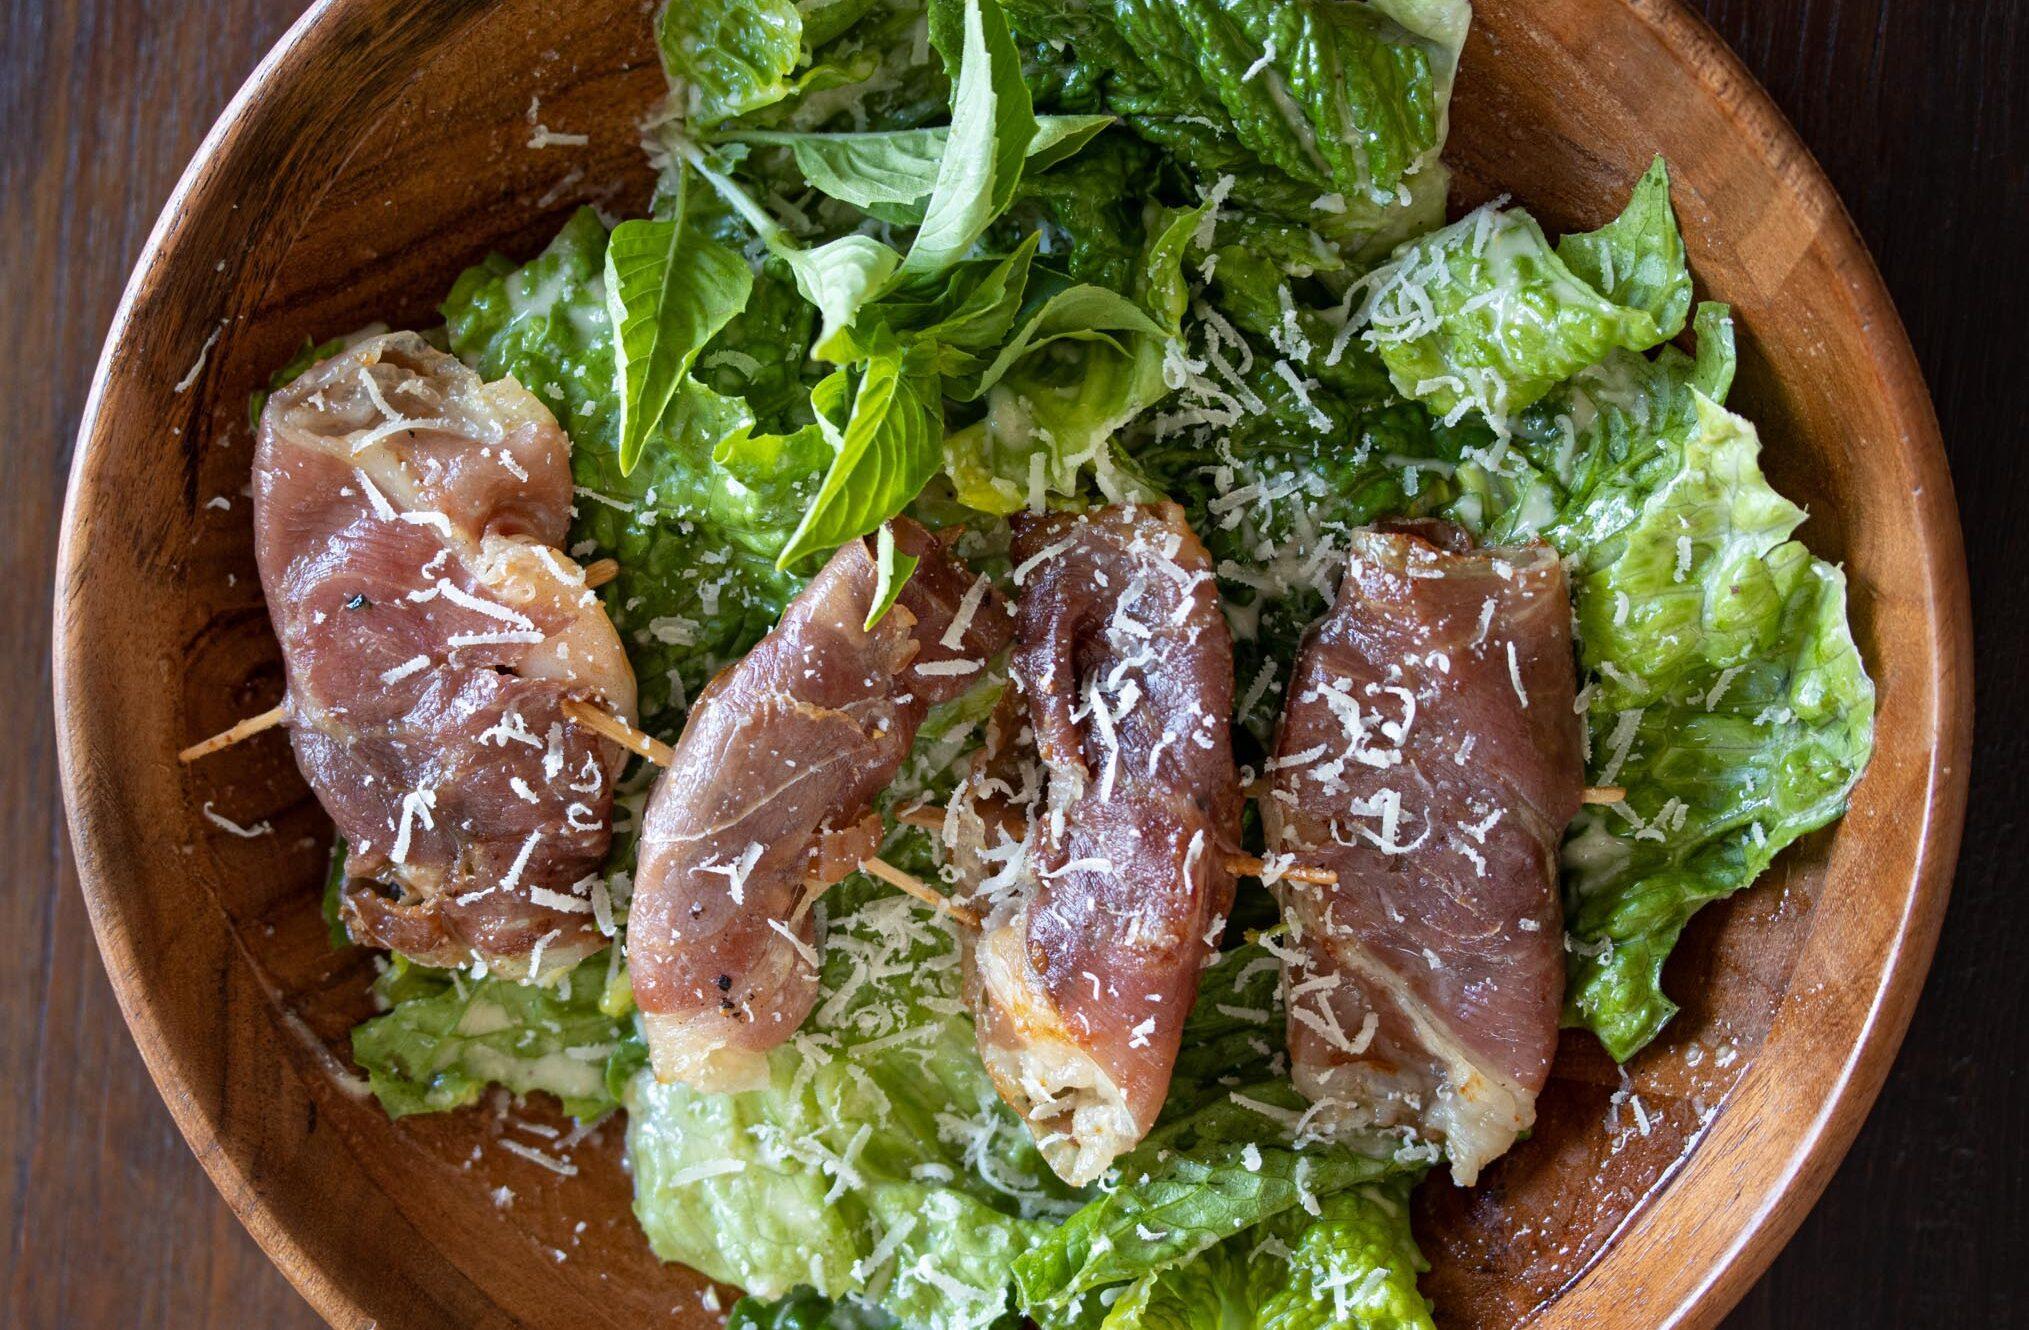 caesar's salad with shrimps saltimbocca